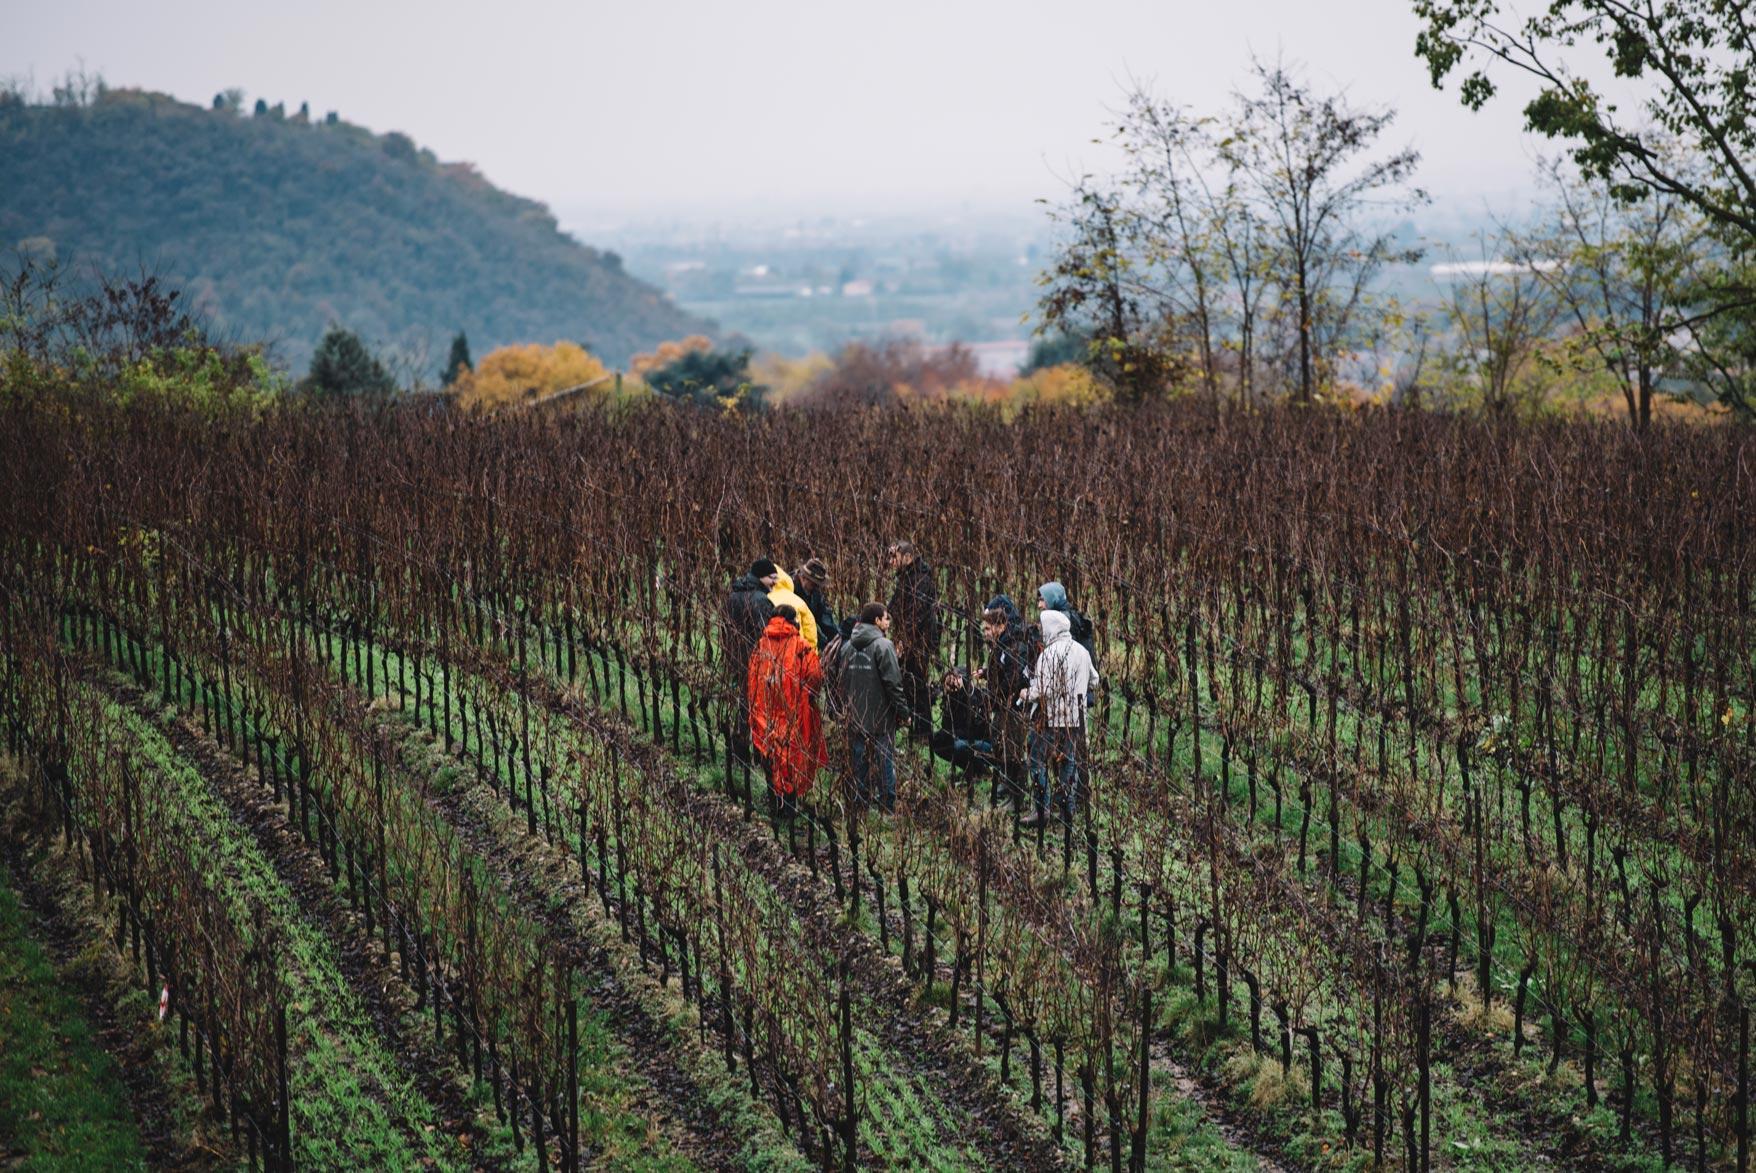 Pratique de la taille | Bellavista | Franciacorta | Lombardia